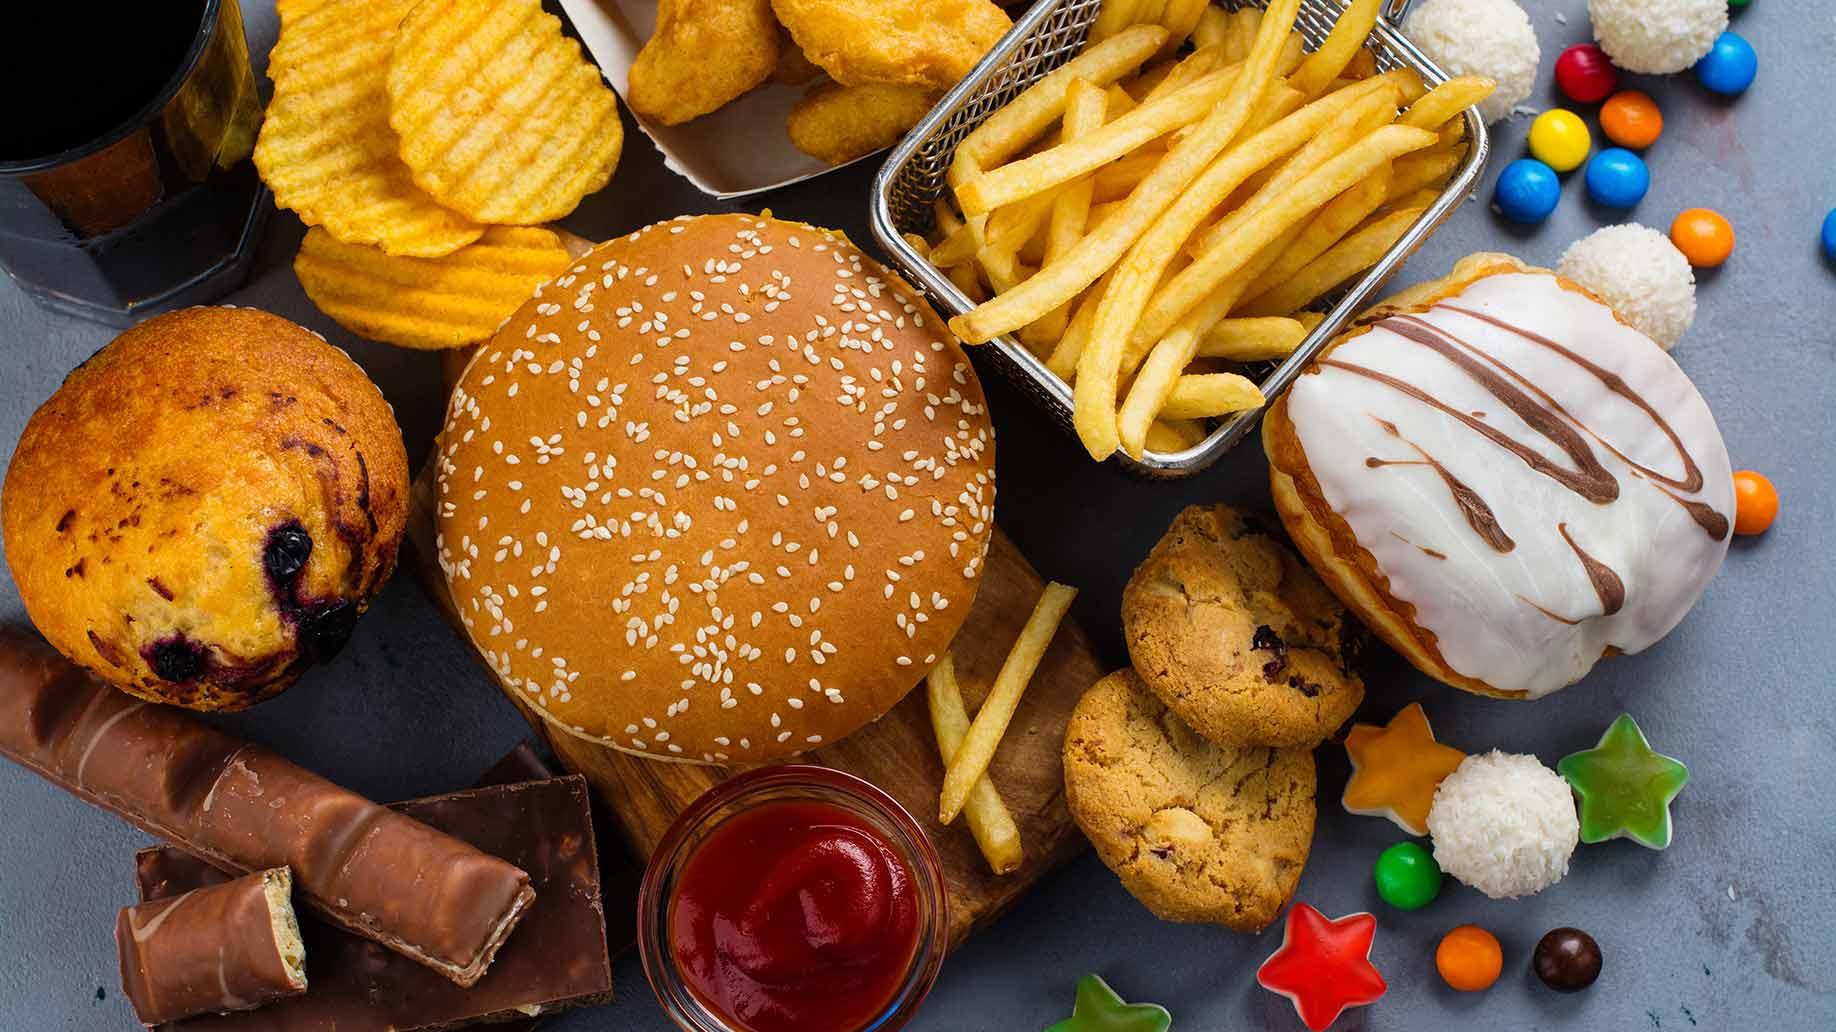 diabetes insulin blood sugar fat fried foods natural remedies turmeric curcumin health benefits